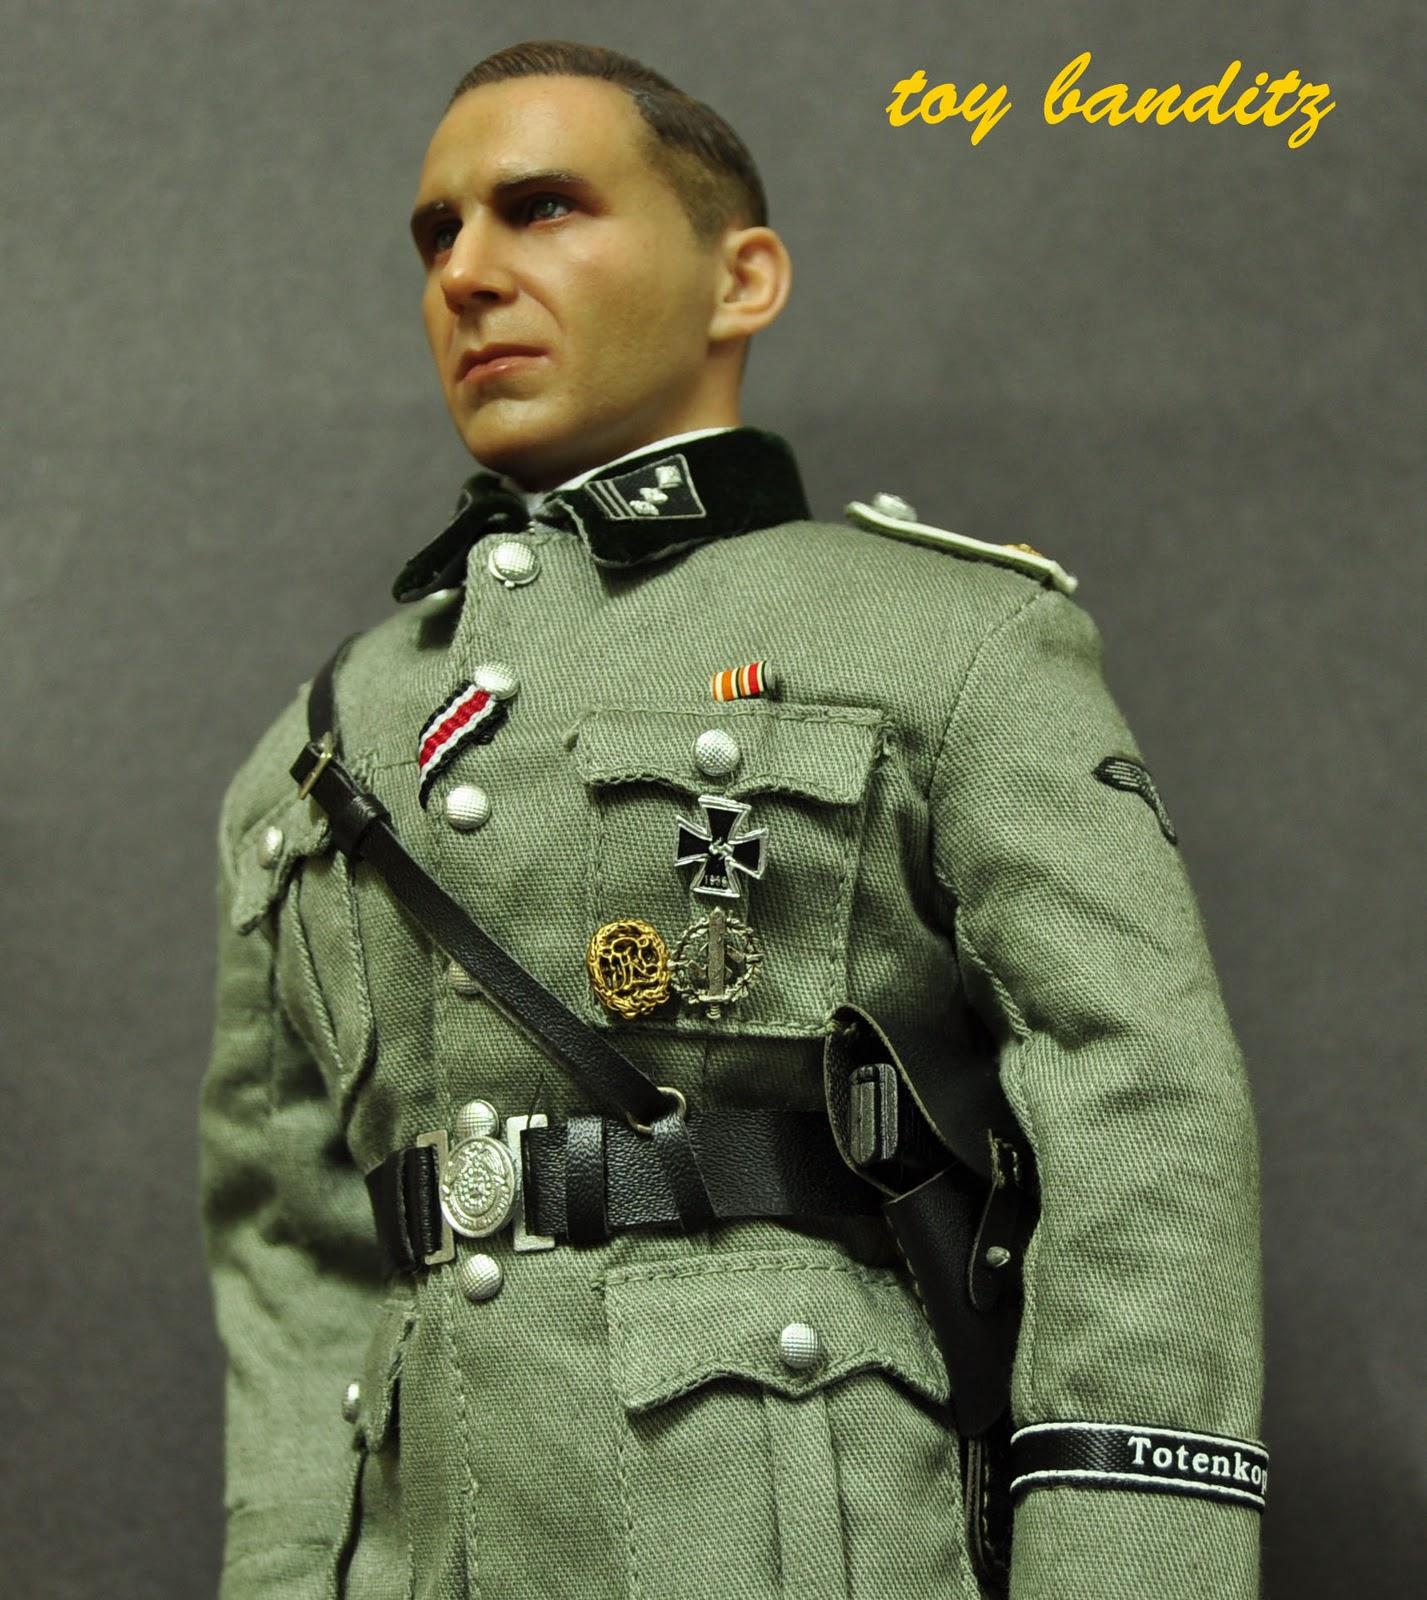 Toy Banditz: DID SS PANZER-DIVISION TOTENKOPF